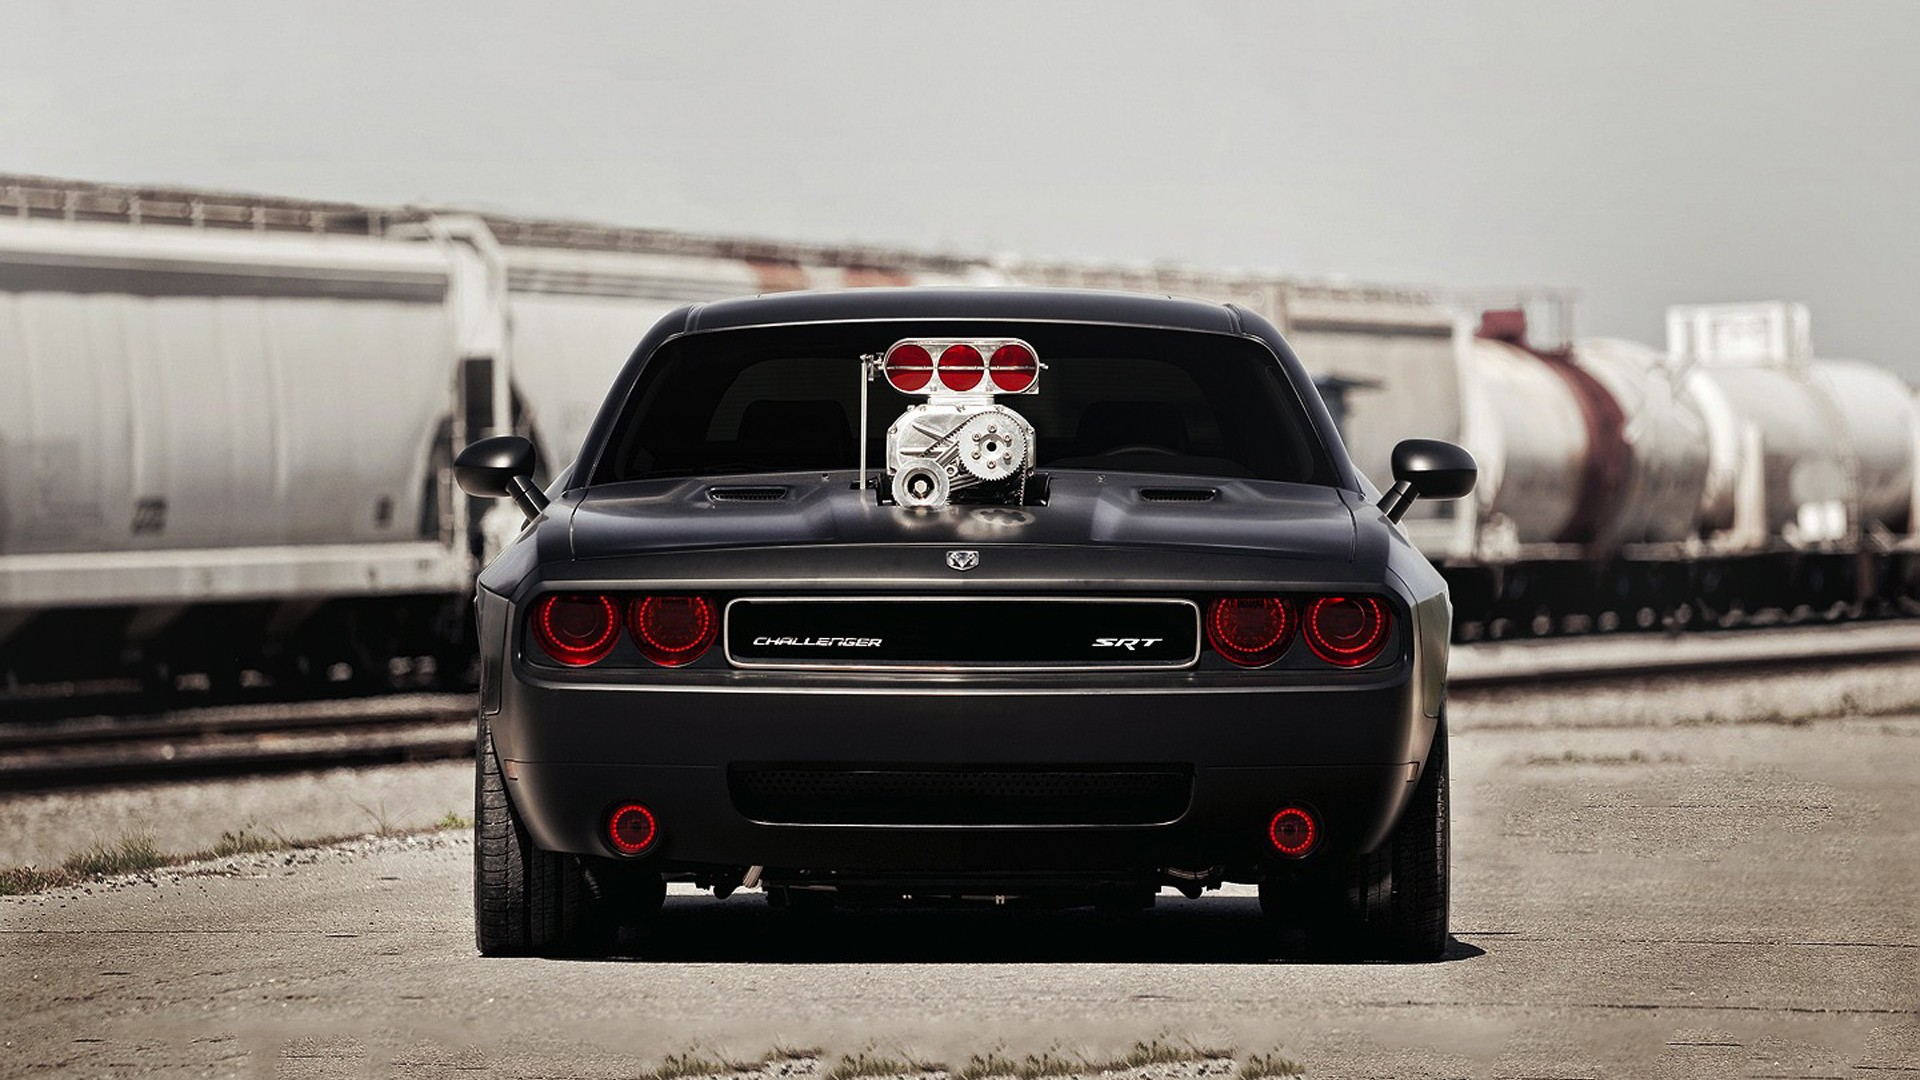 Dodge Challenger Srt Hd Wallpaper Background Image 1920x1080